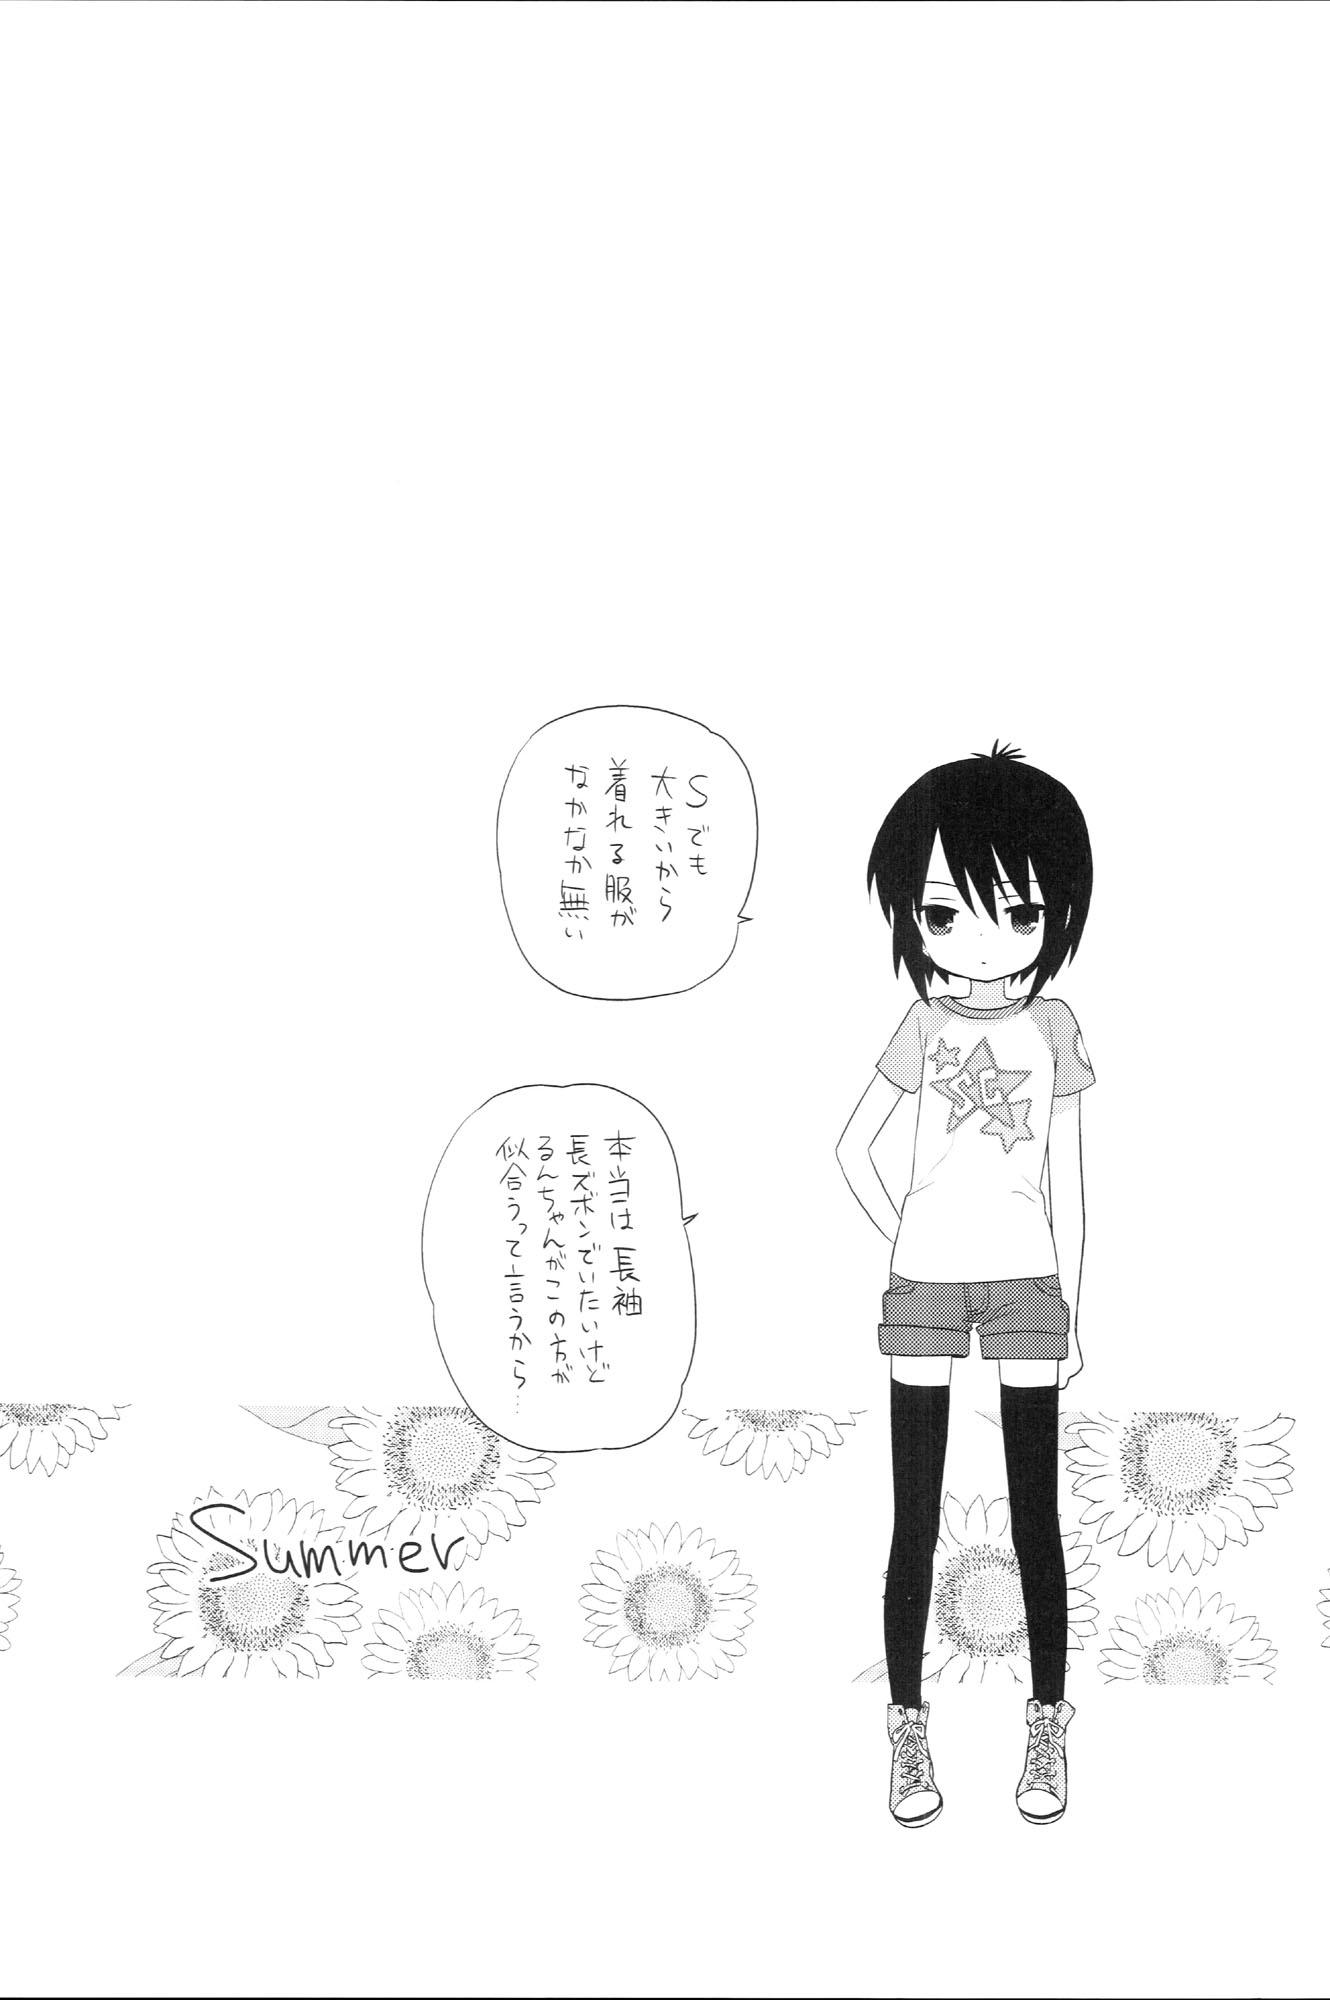 A, Channel, Ichii, Tooru, flower, monochrome, short, hair, shorts, stars, thigh, highs, картинка, аниме, anime, picture, картинки, |, разные, красивые, pictures